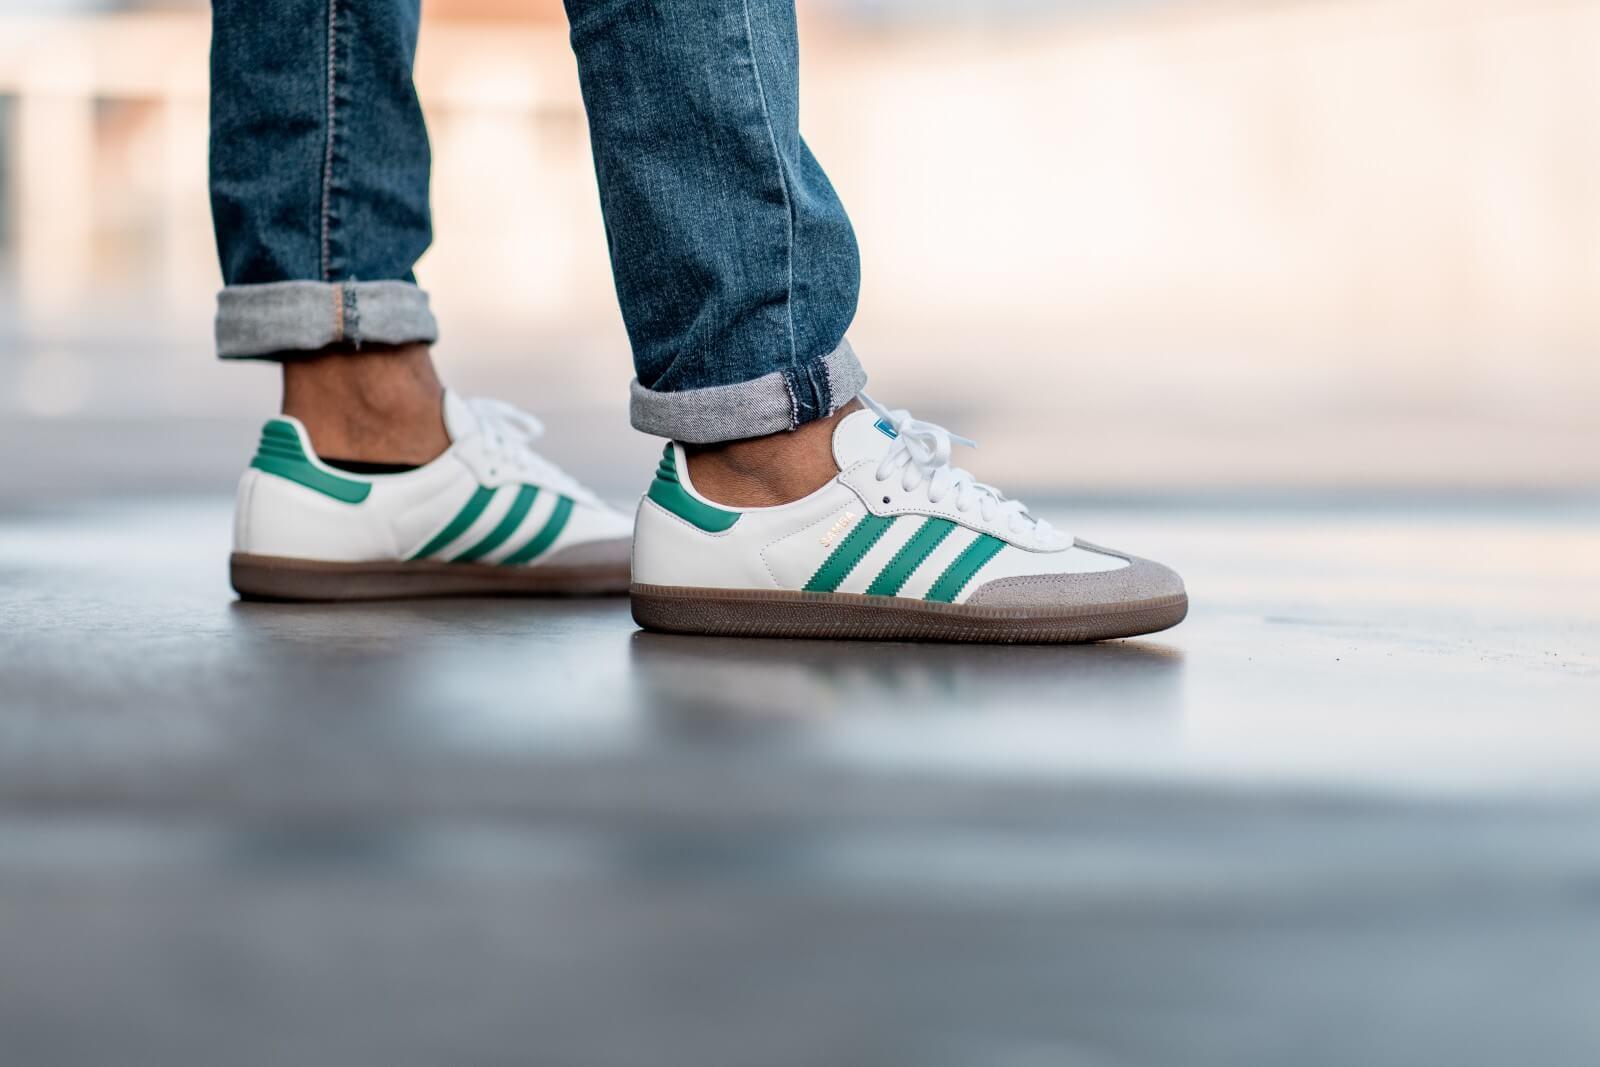 adidas Samba Super | Adidas samba, Mens trainers, Adidas